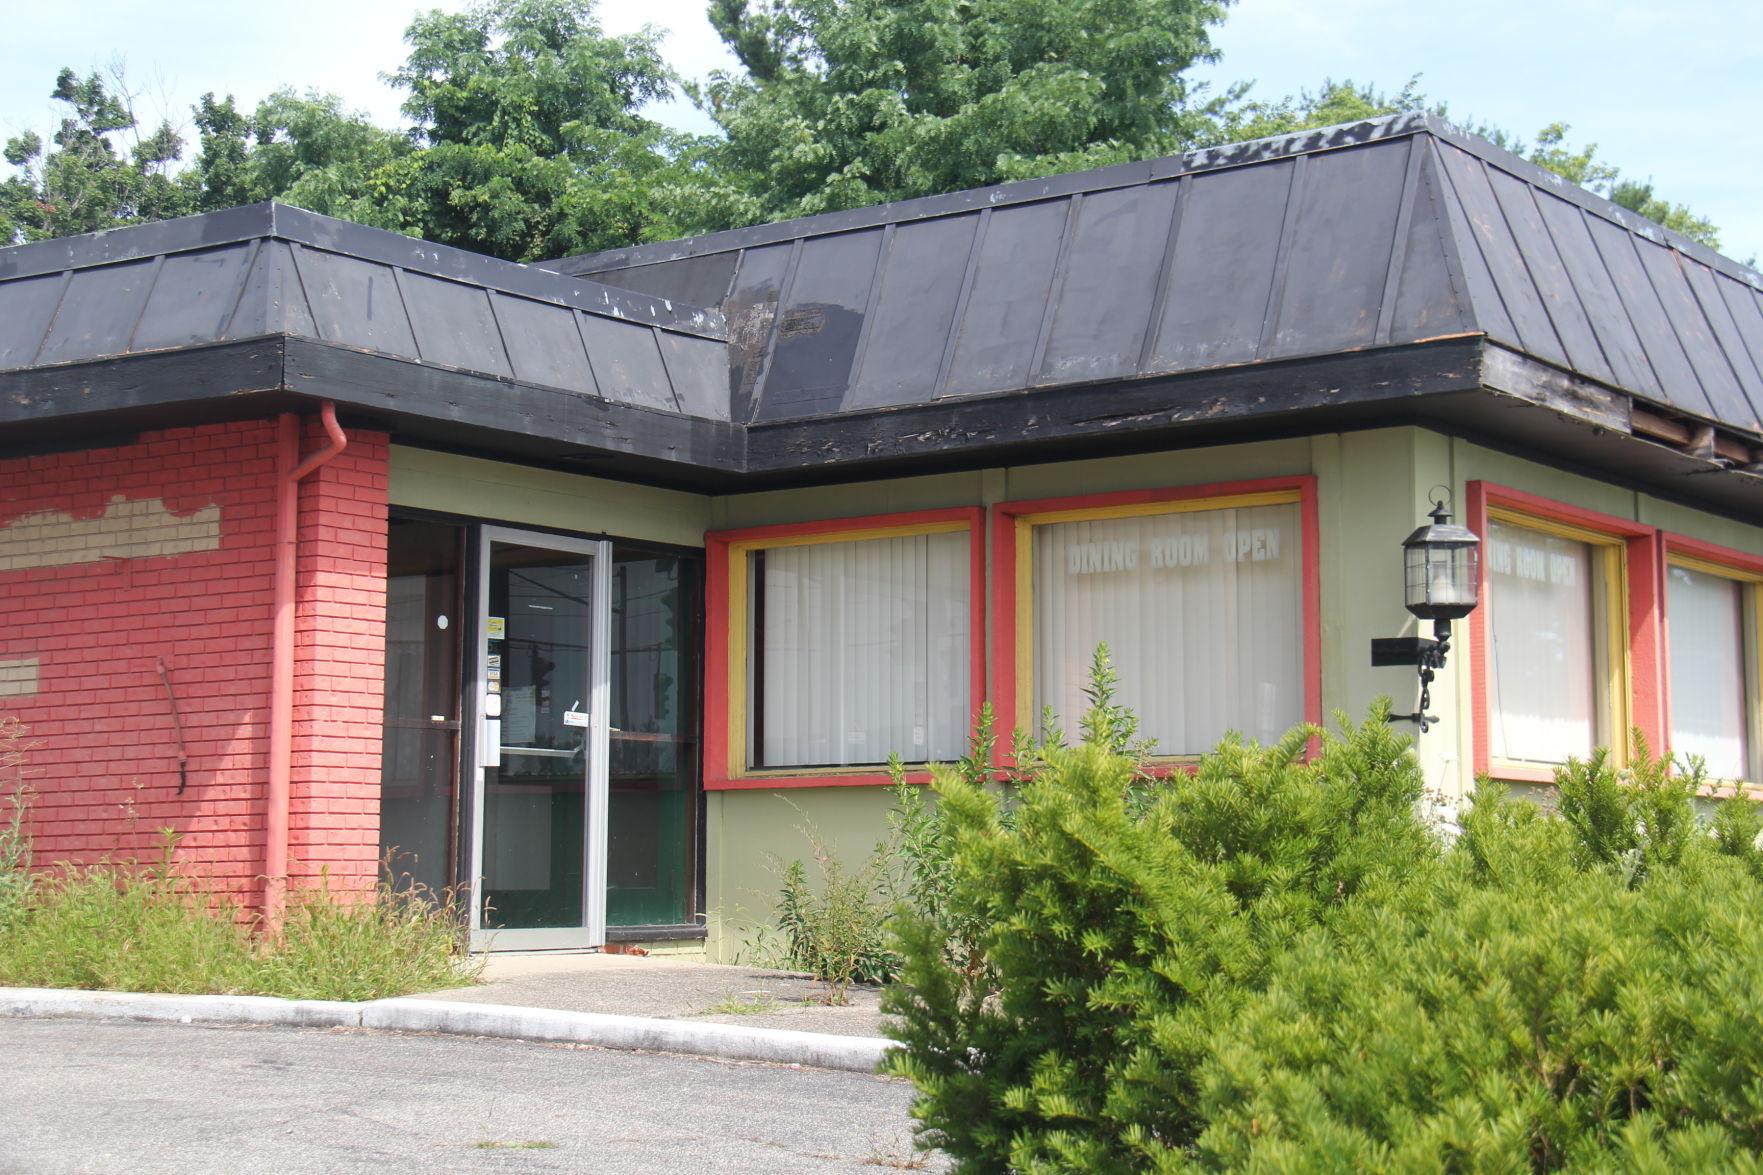 ontario may order demolition of former east of chicago pizza rh richlandsource com